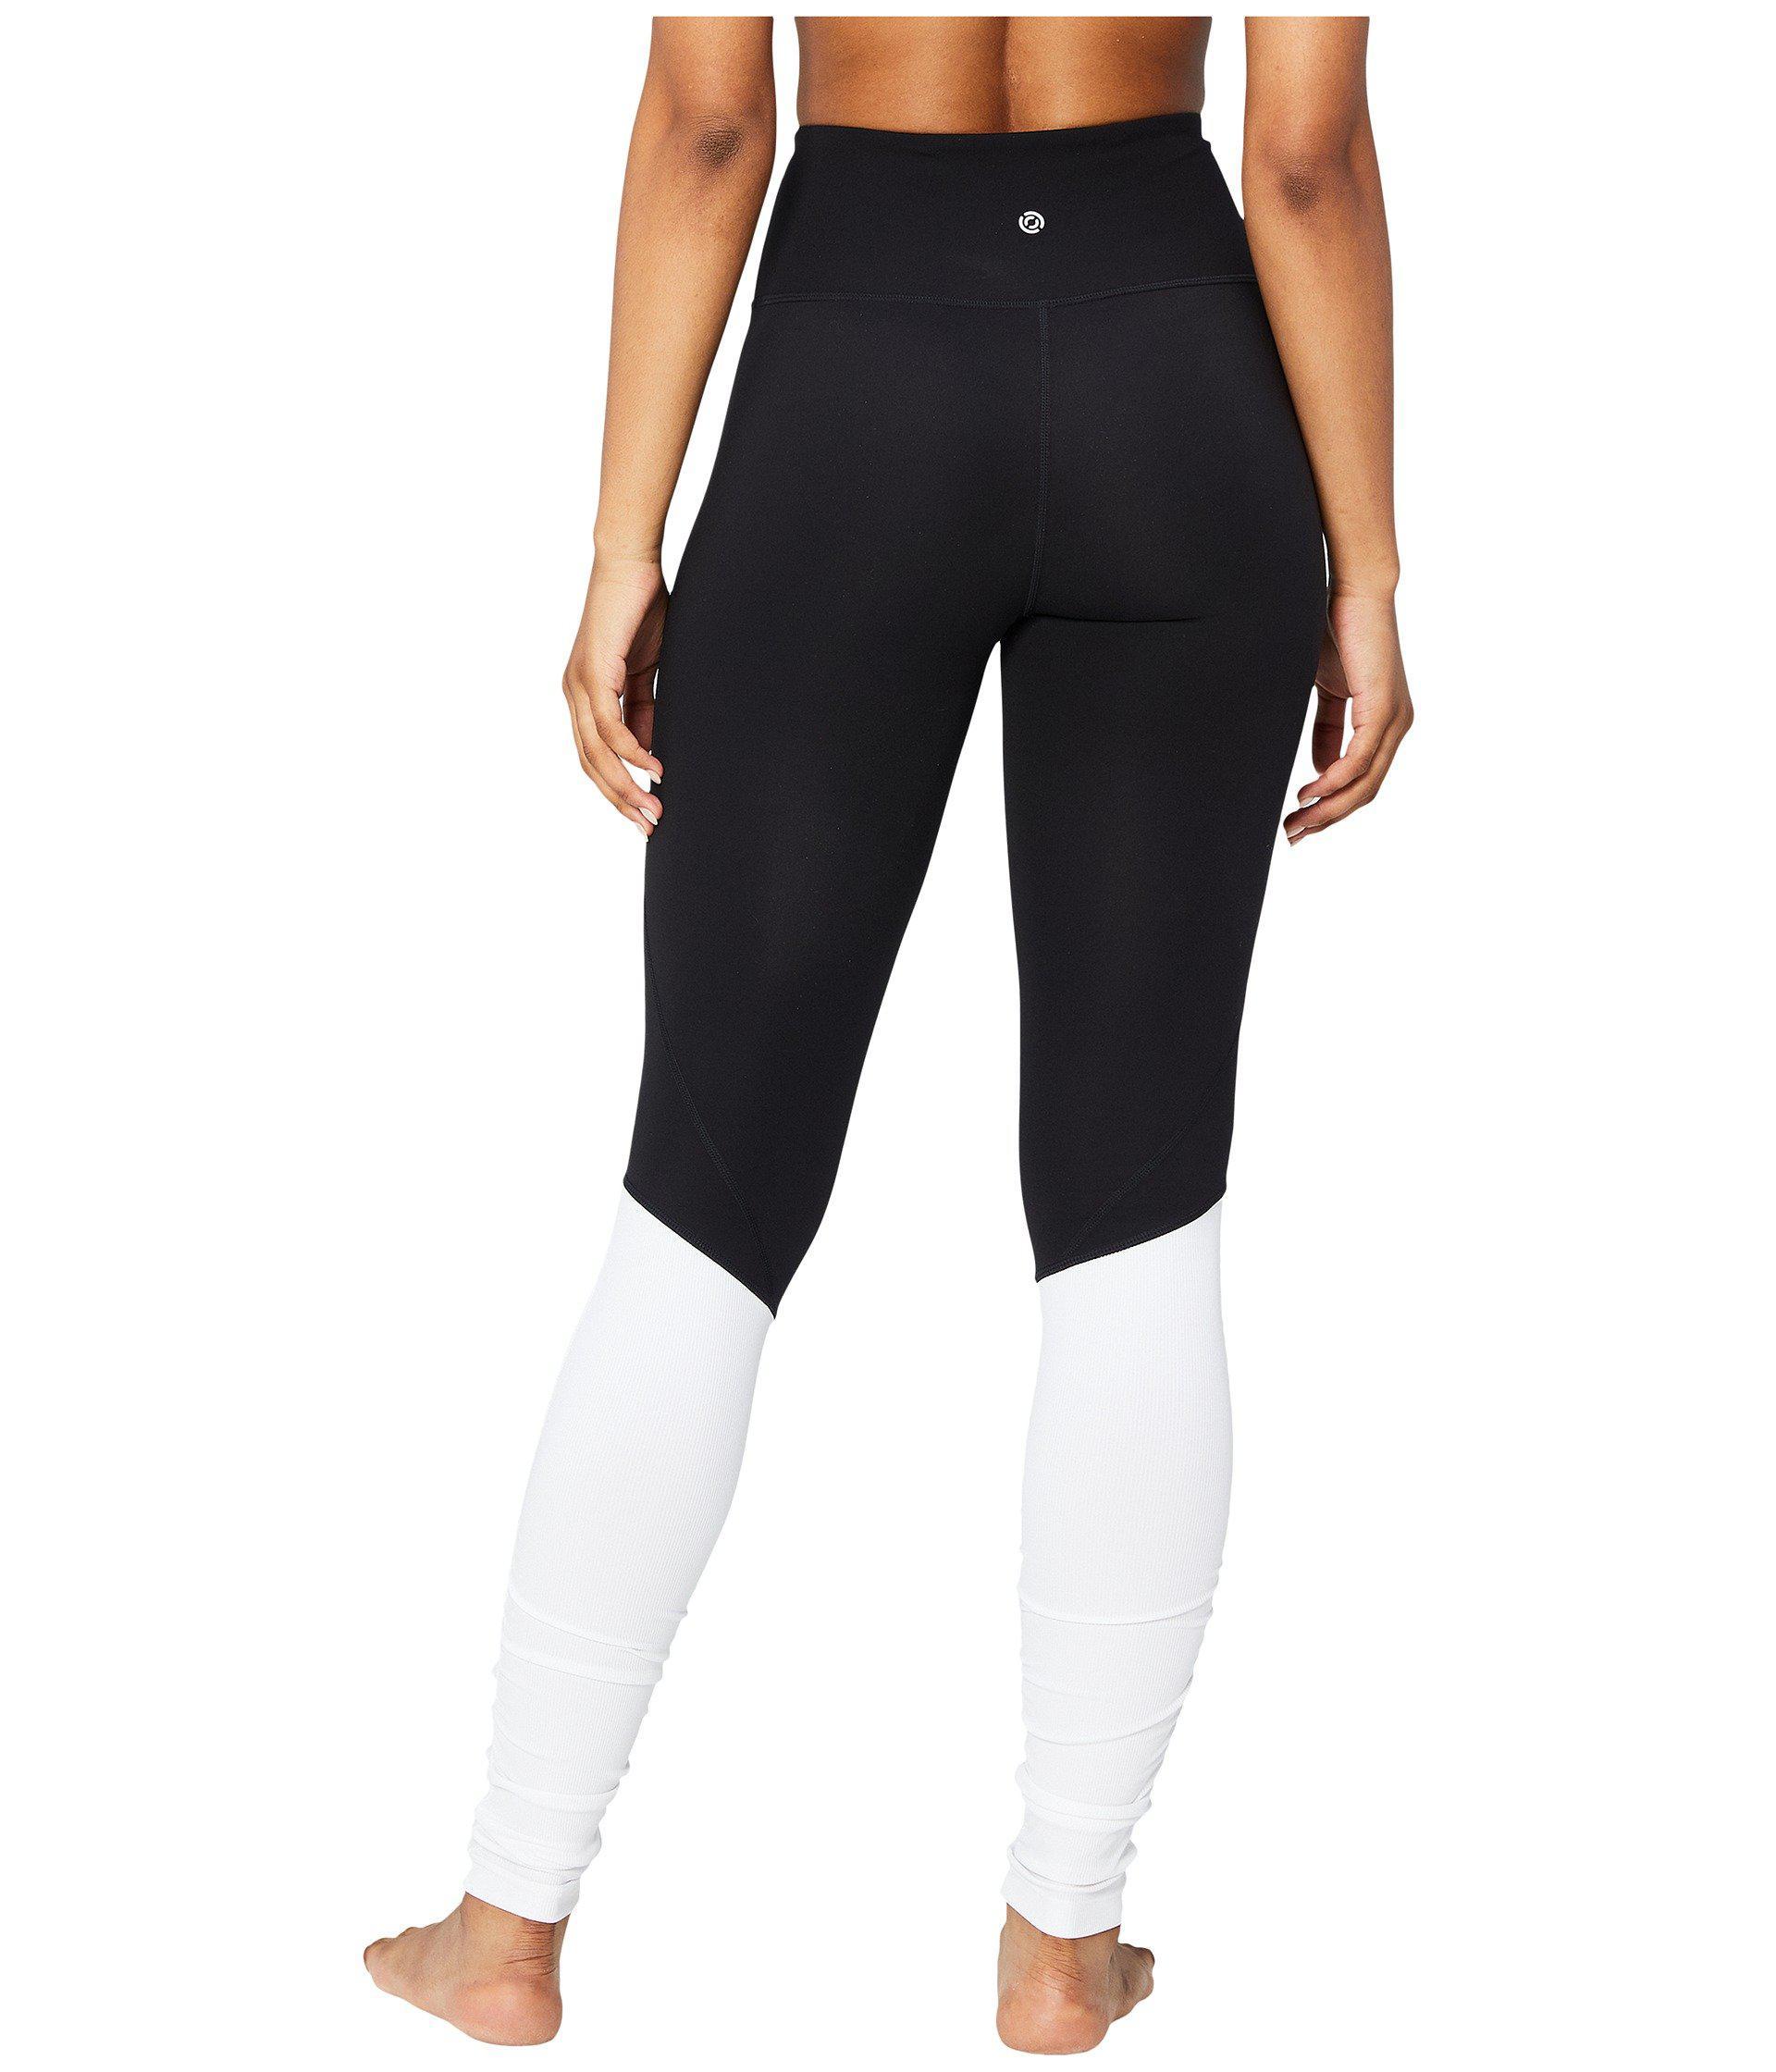 8f434c762ec003 Core 10 Icon Series - The Ballerina Yoga Leggings (black/white ...